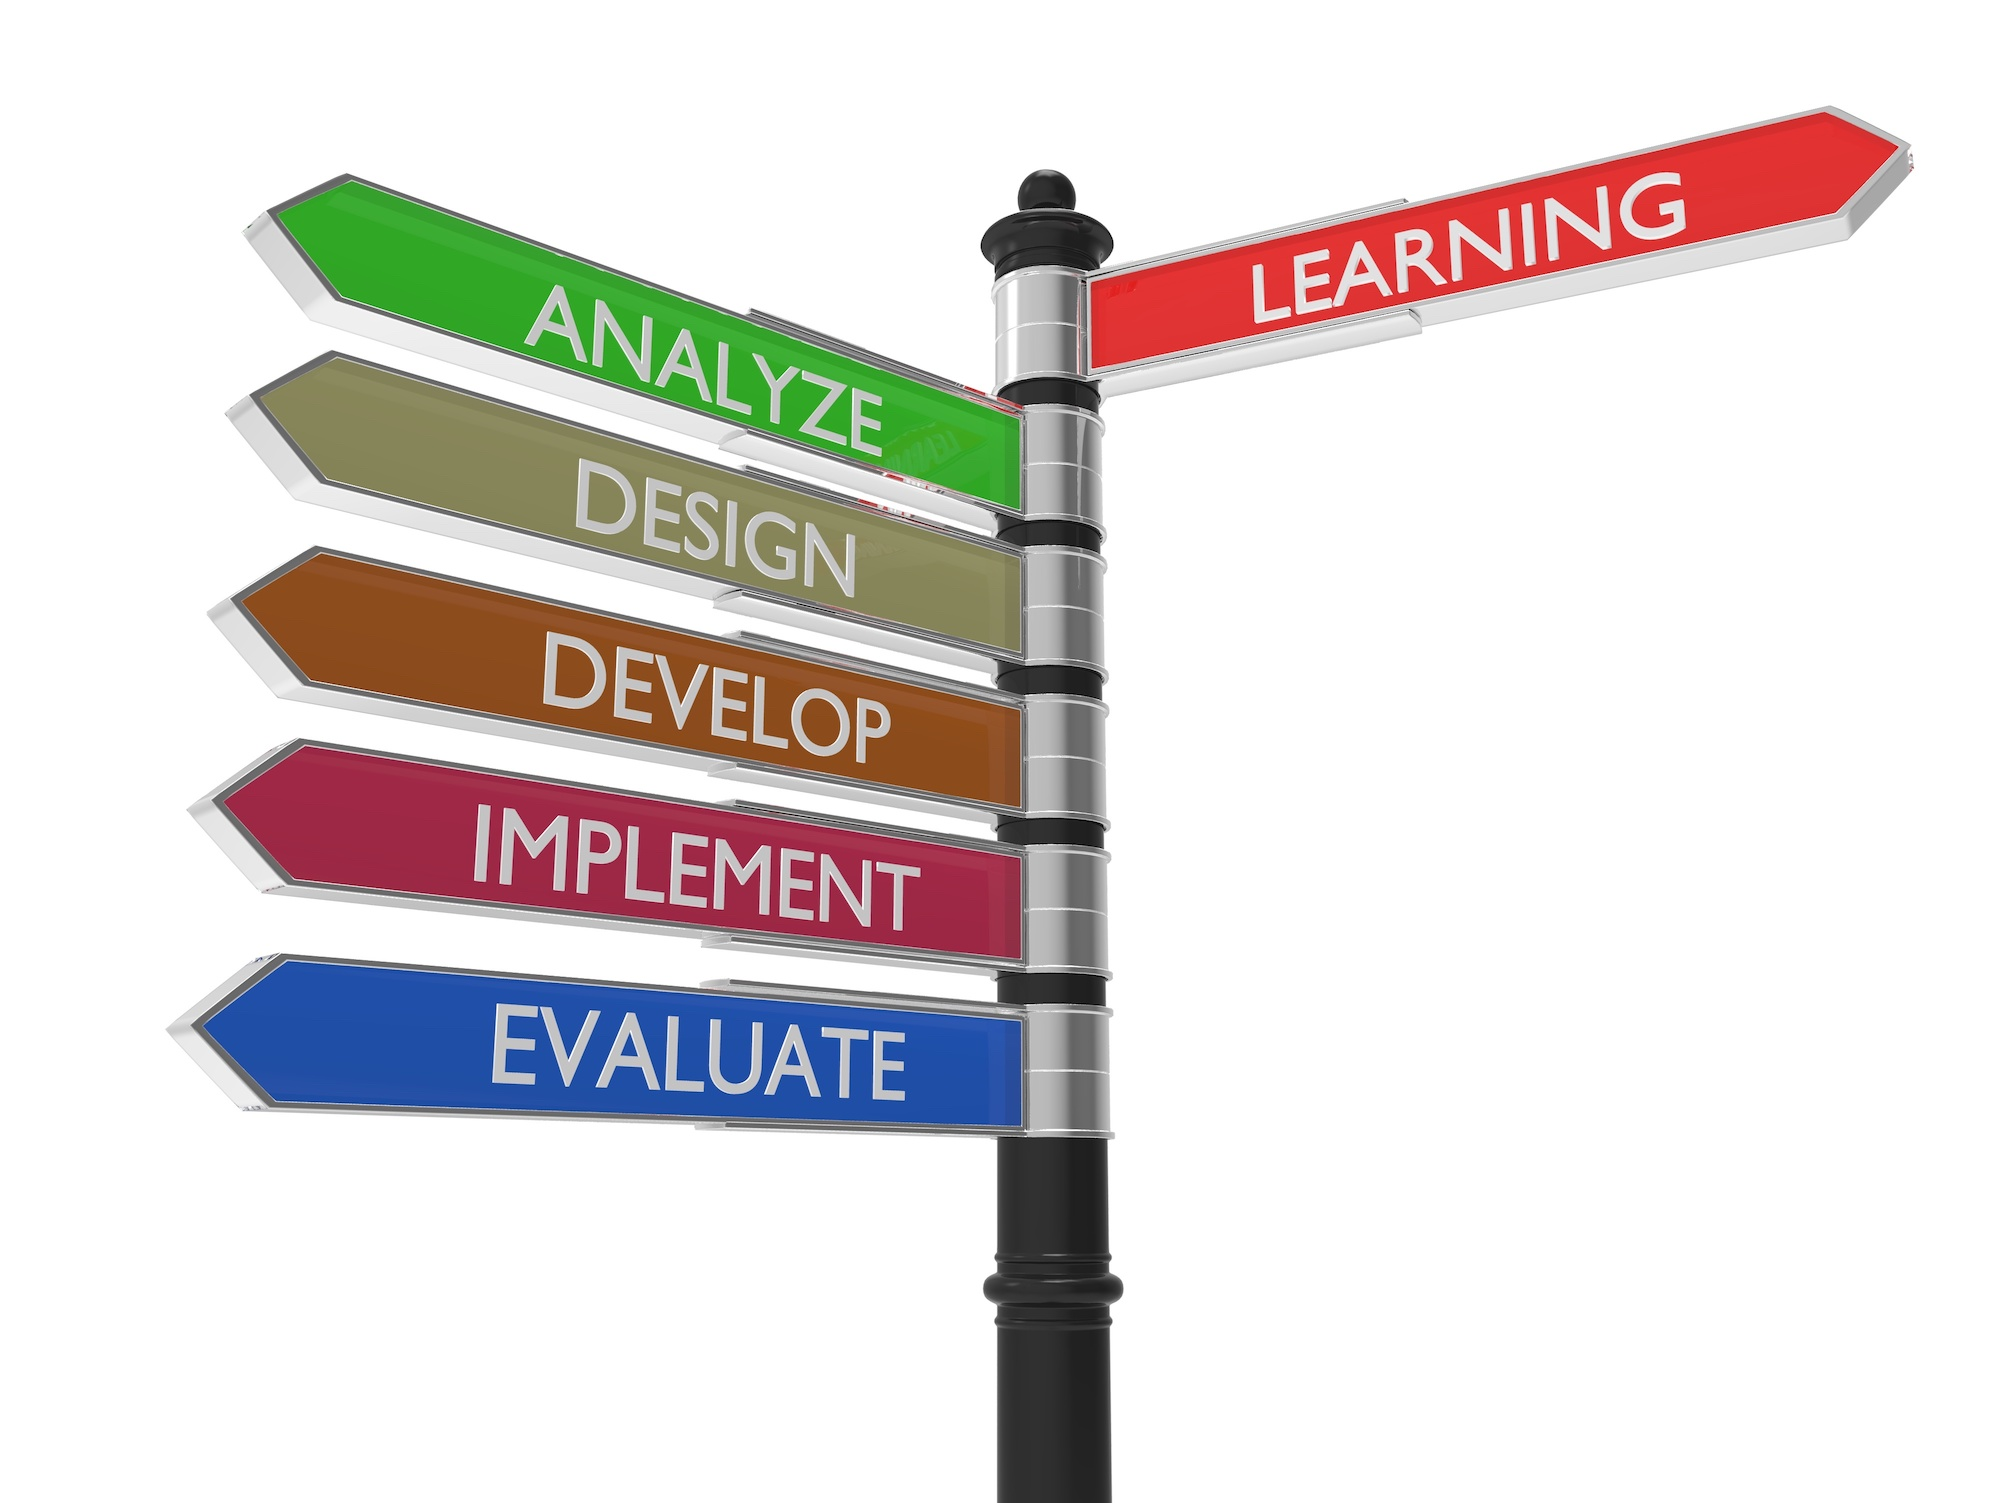 training blog - design is easy, just make 100 PowerPoint slides!